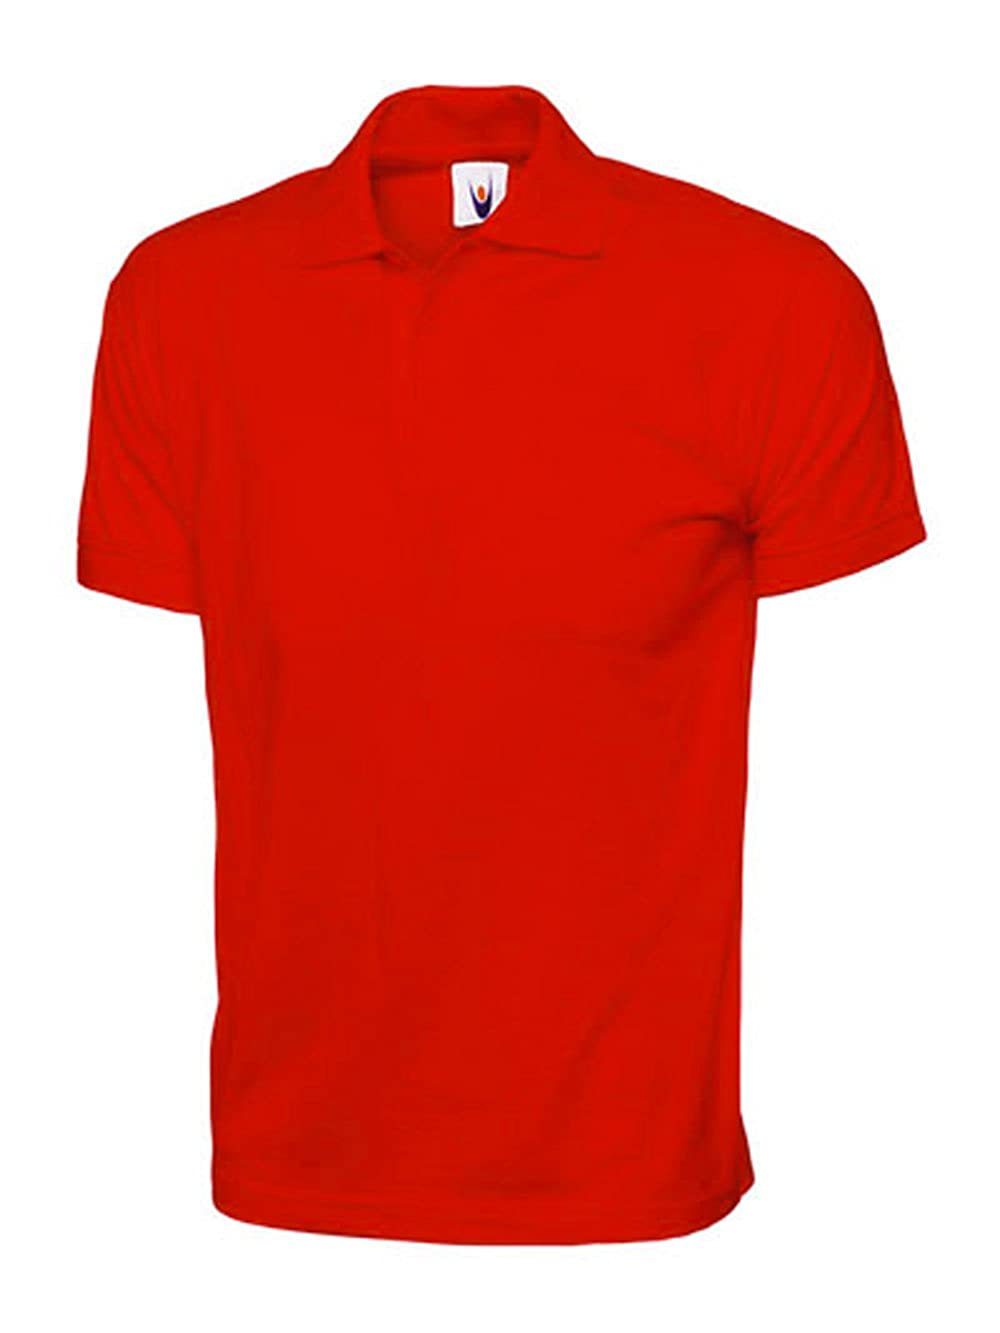 Ladies Polo Shirt Jersey 100 Cotton Loose Fit T Shirt Premium Soft